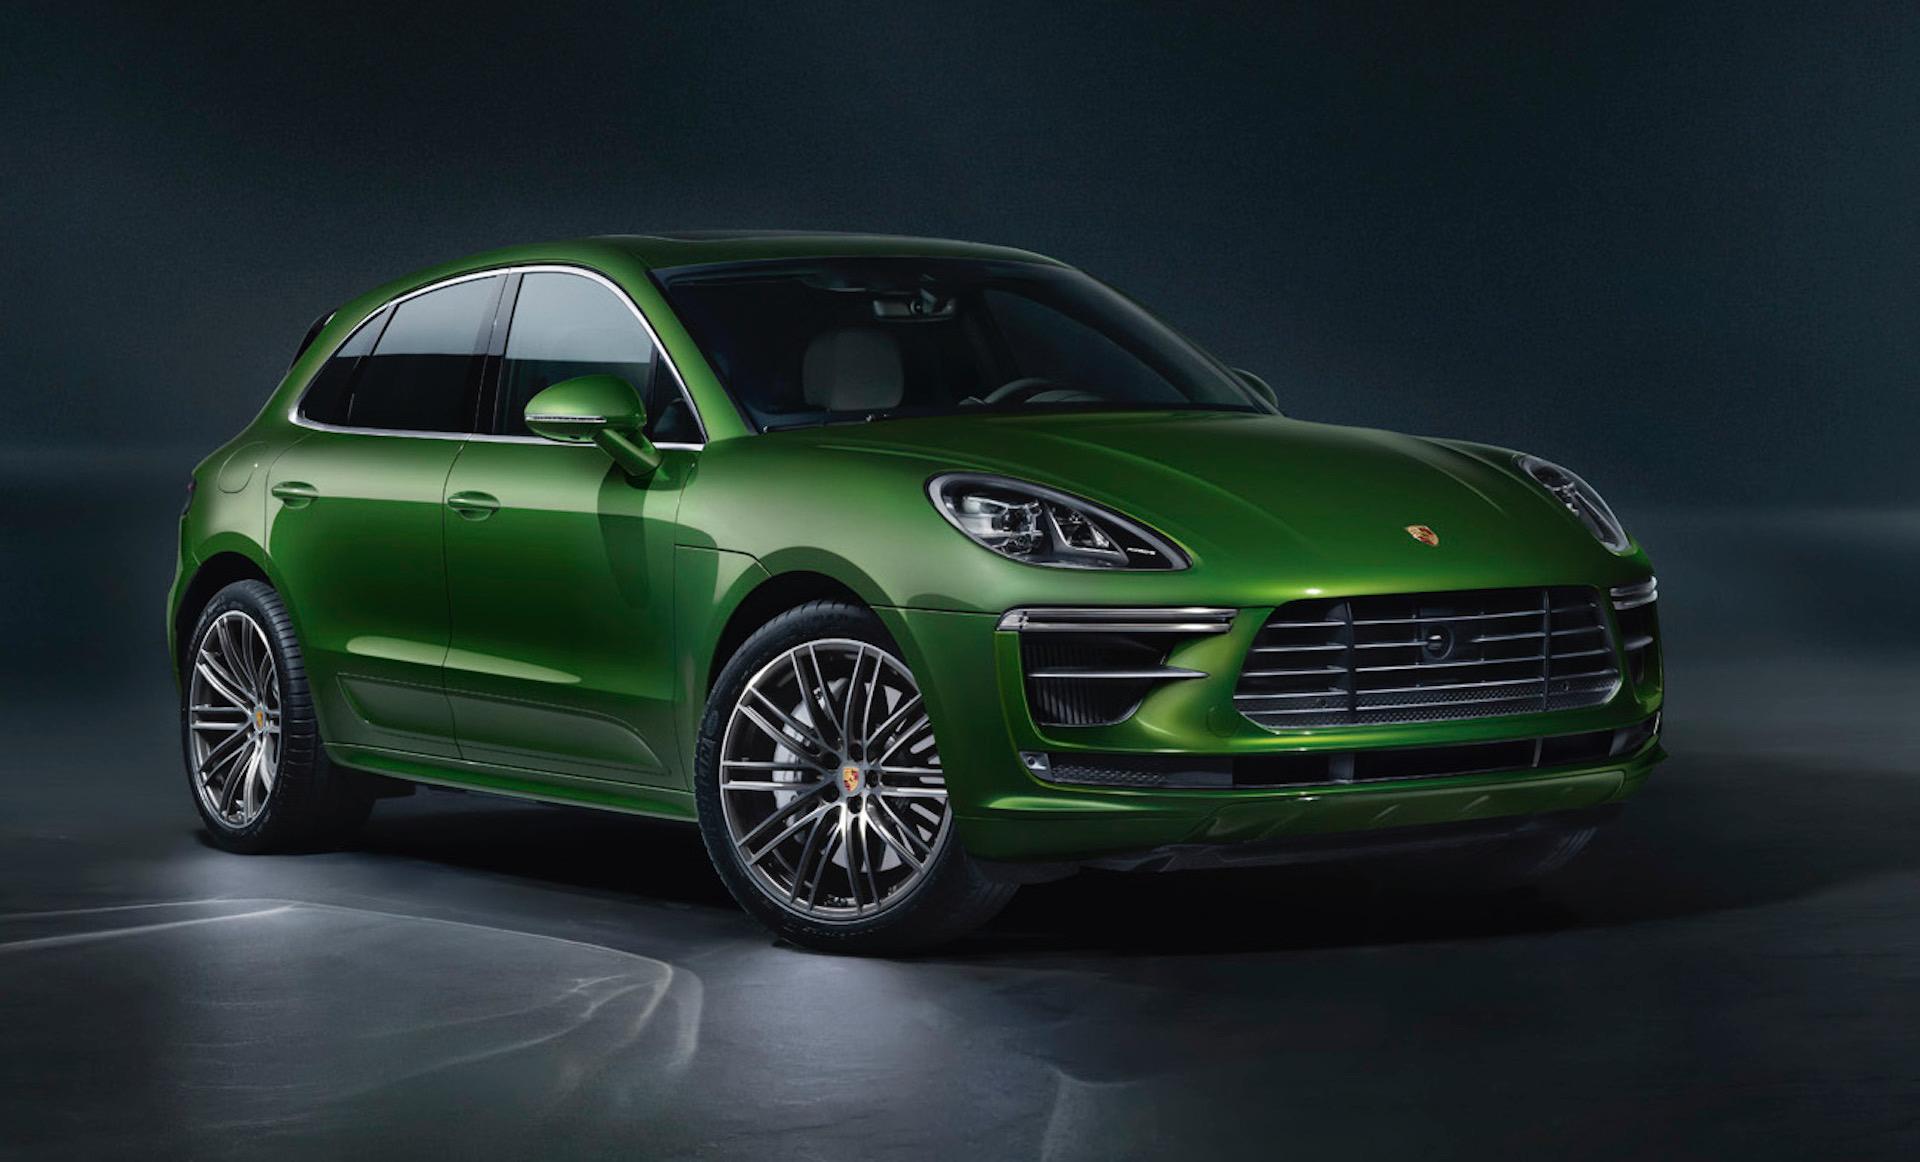 2020 Porsche Macan Turbo revealed, gets 2.9TT